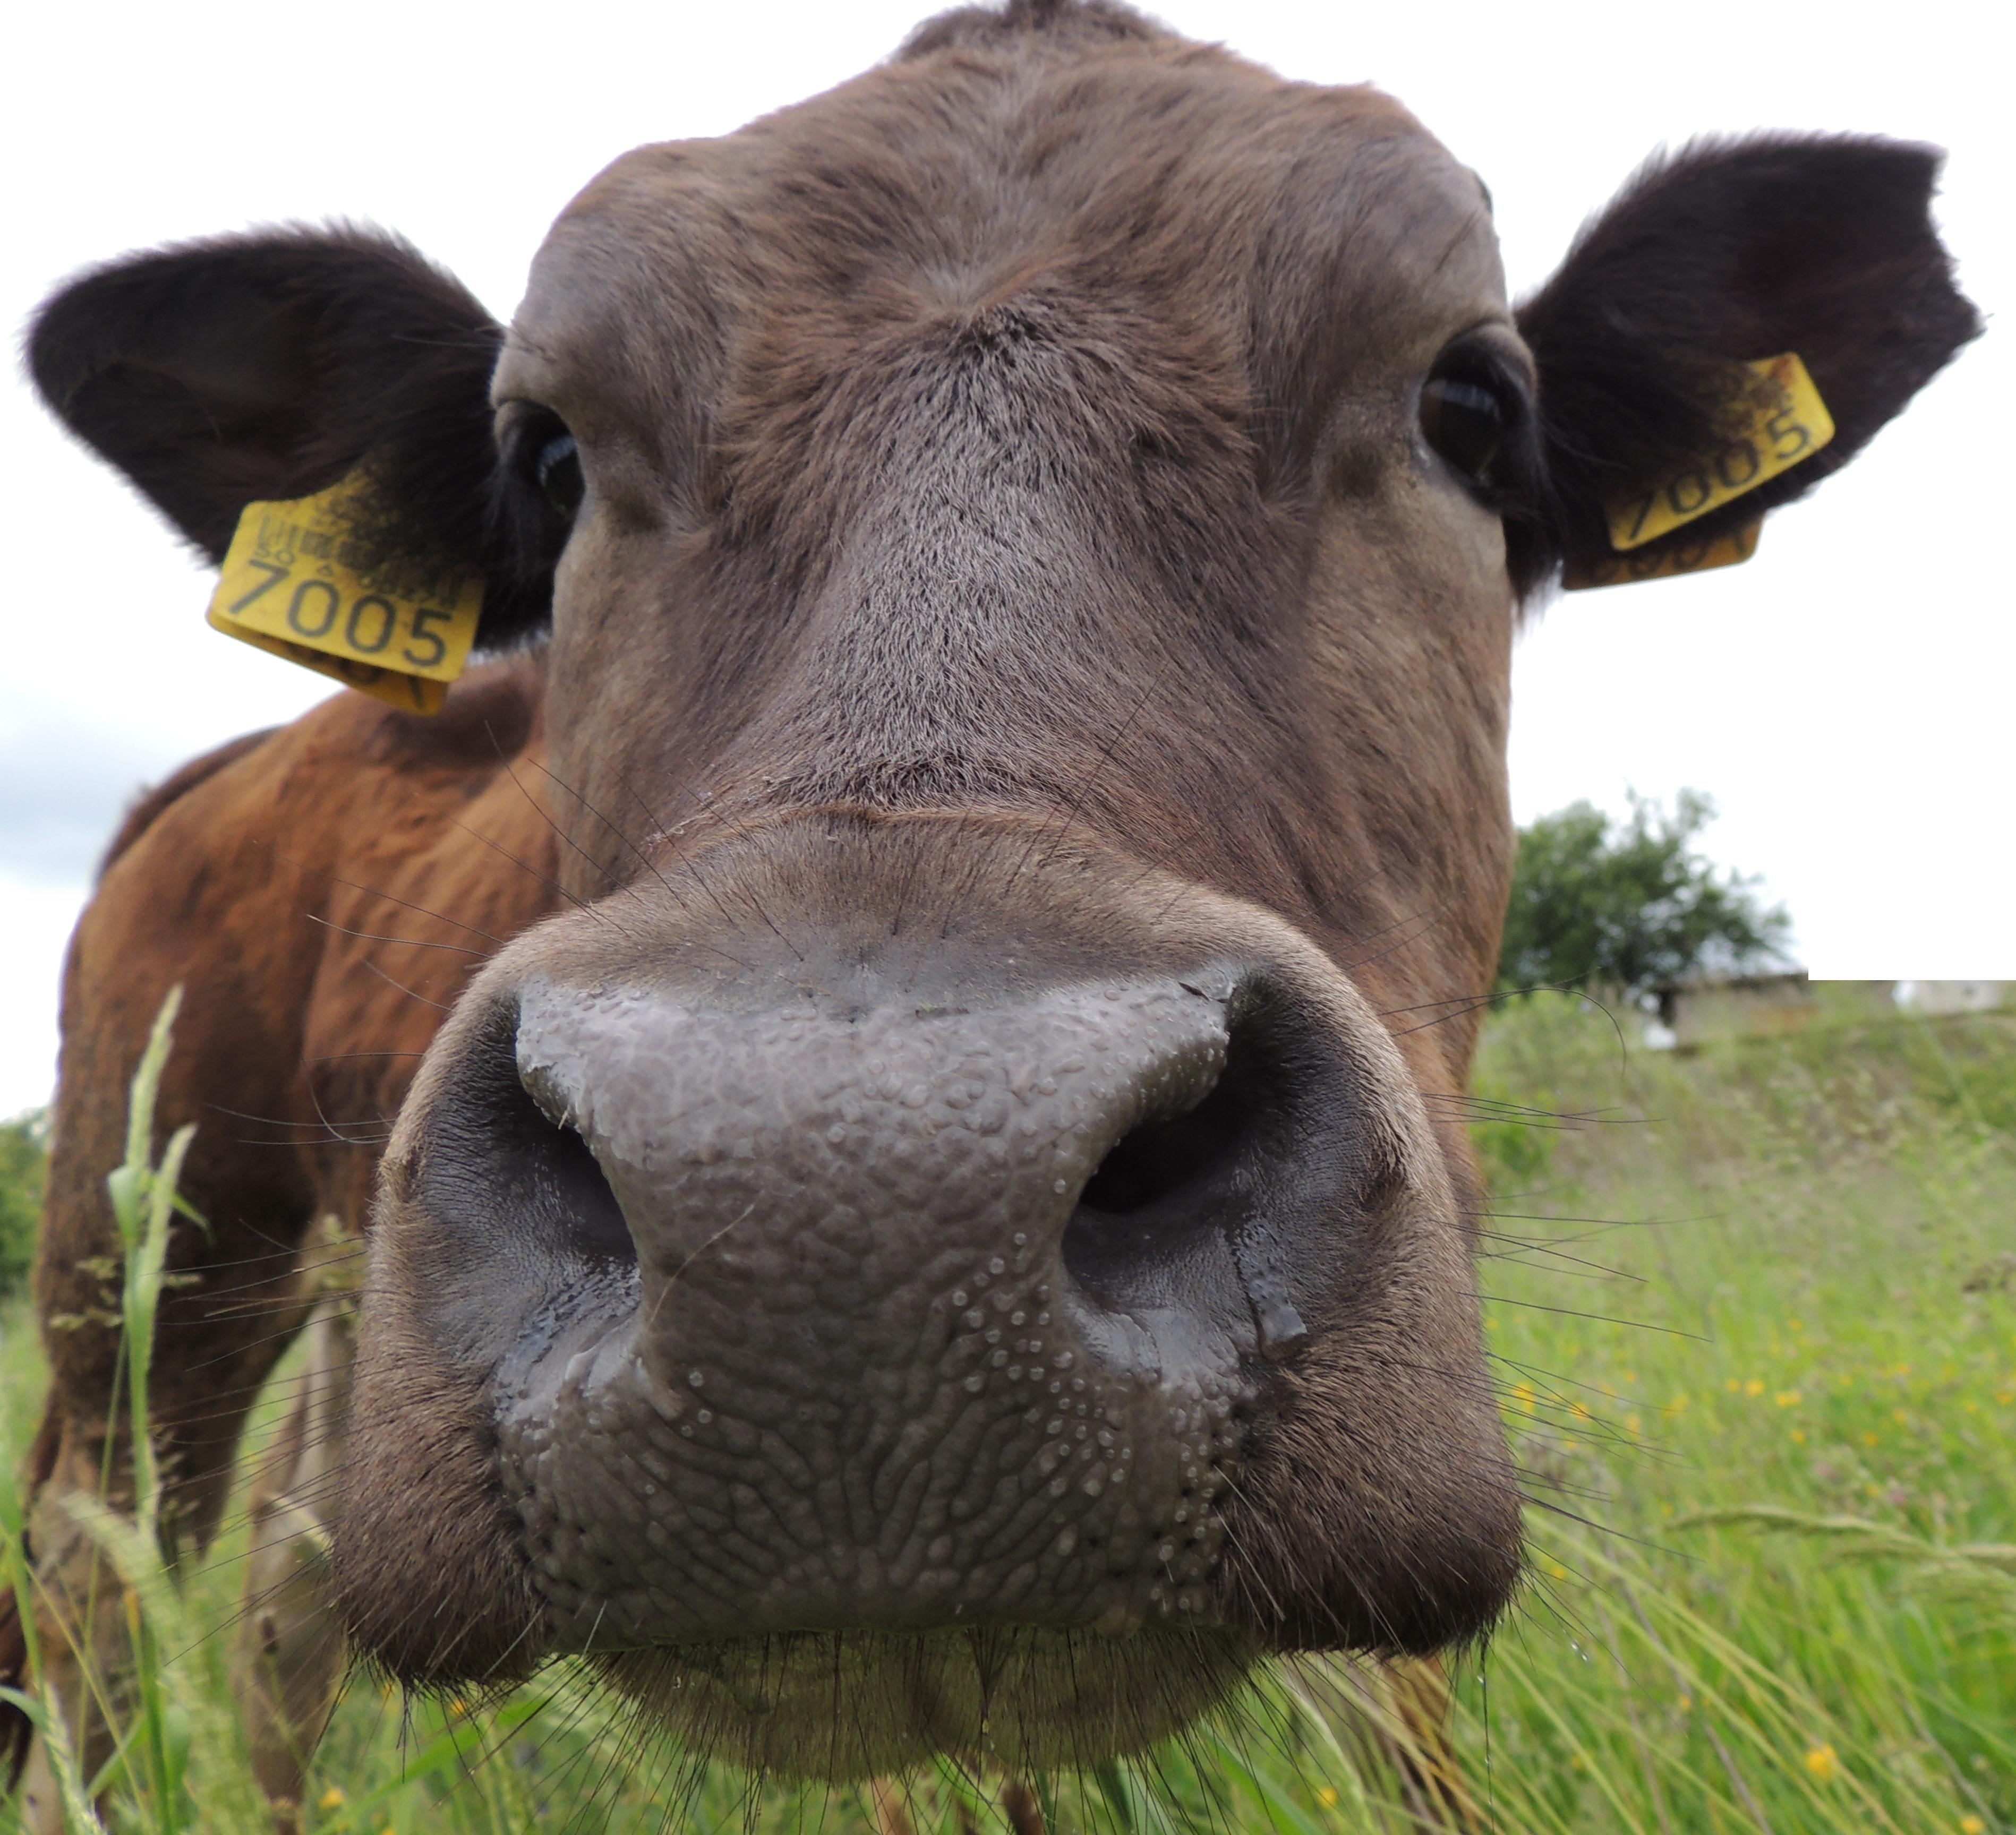 Human cows xxx sexe women